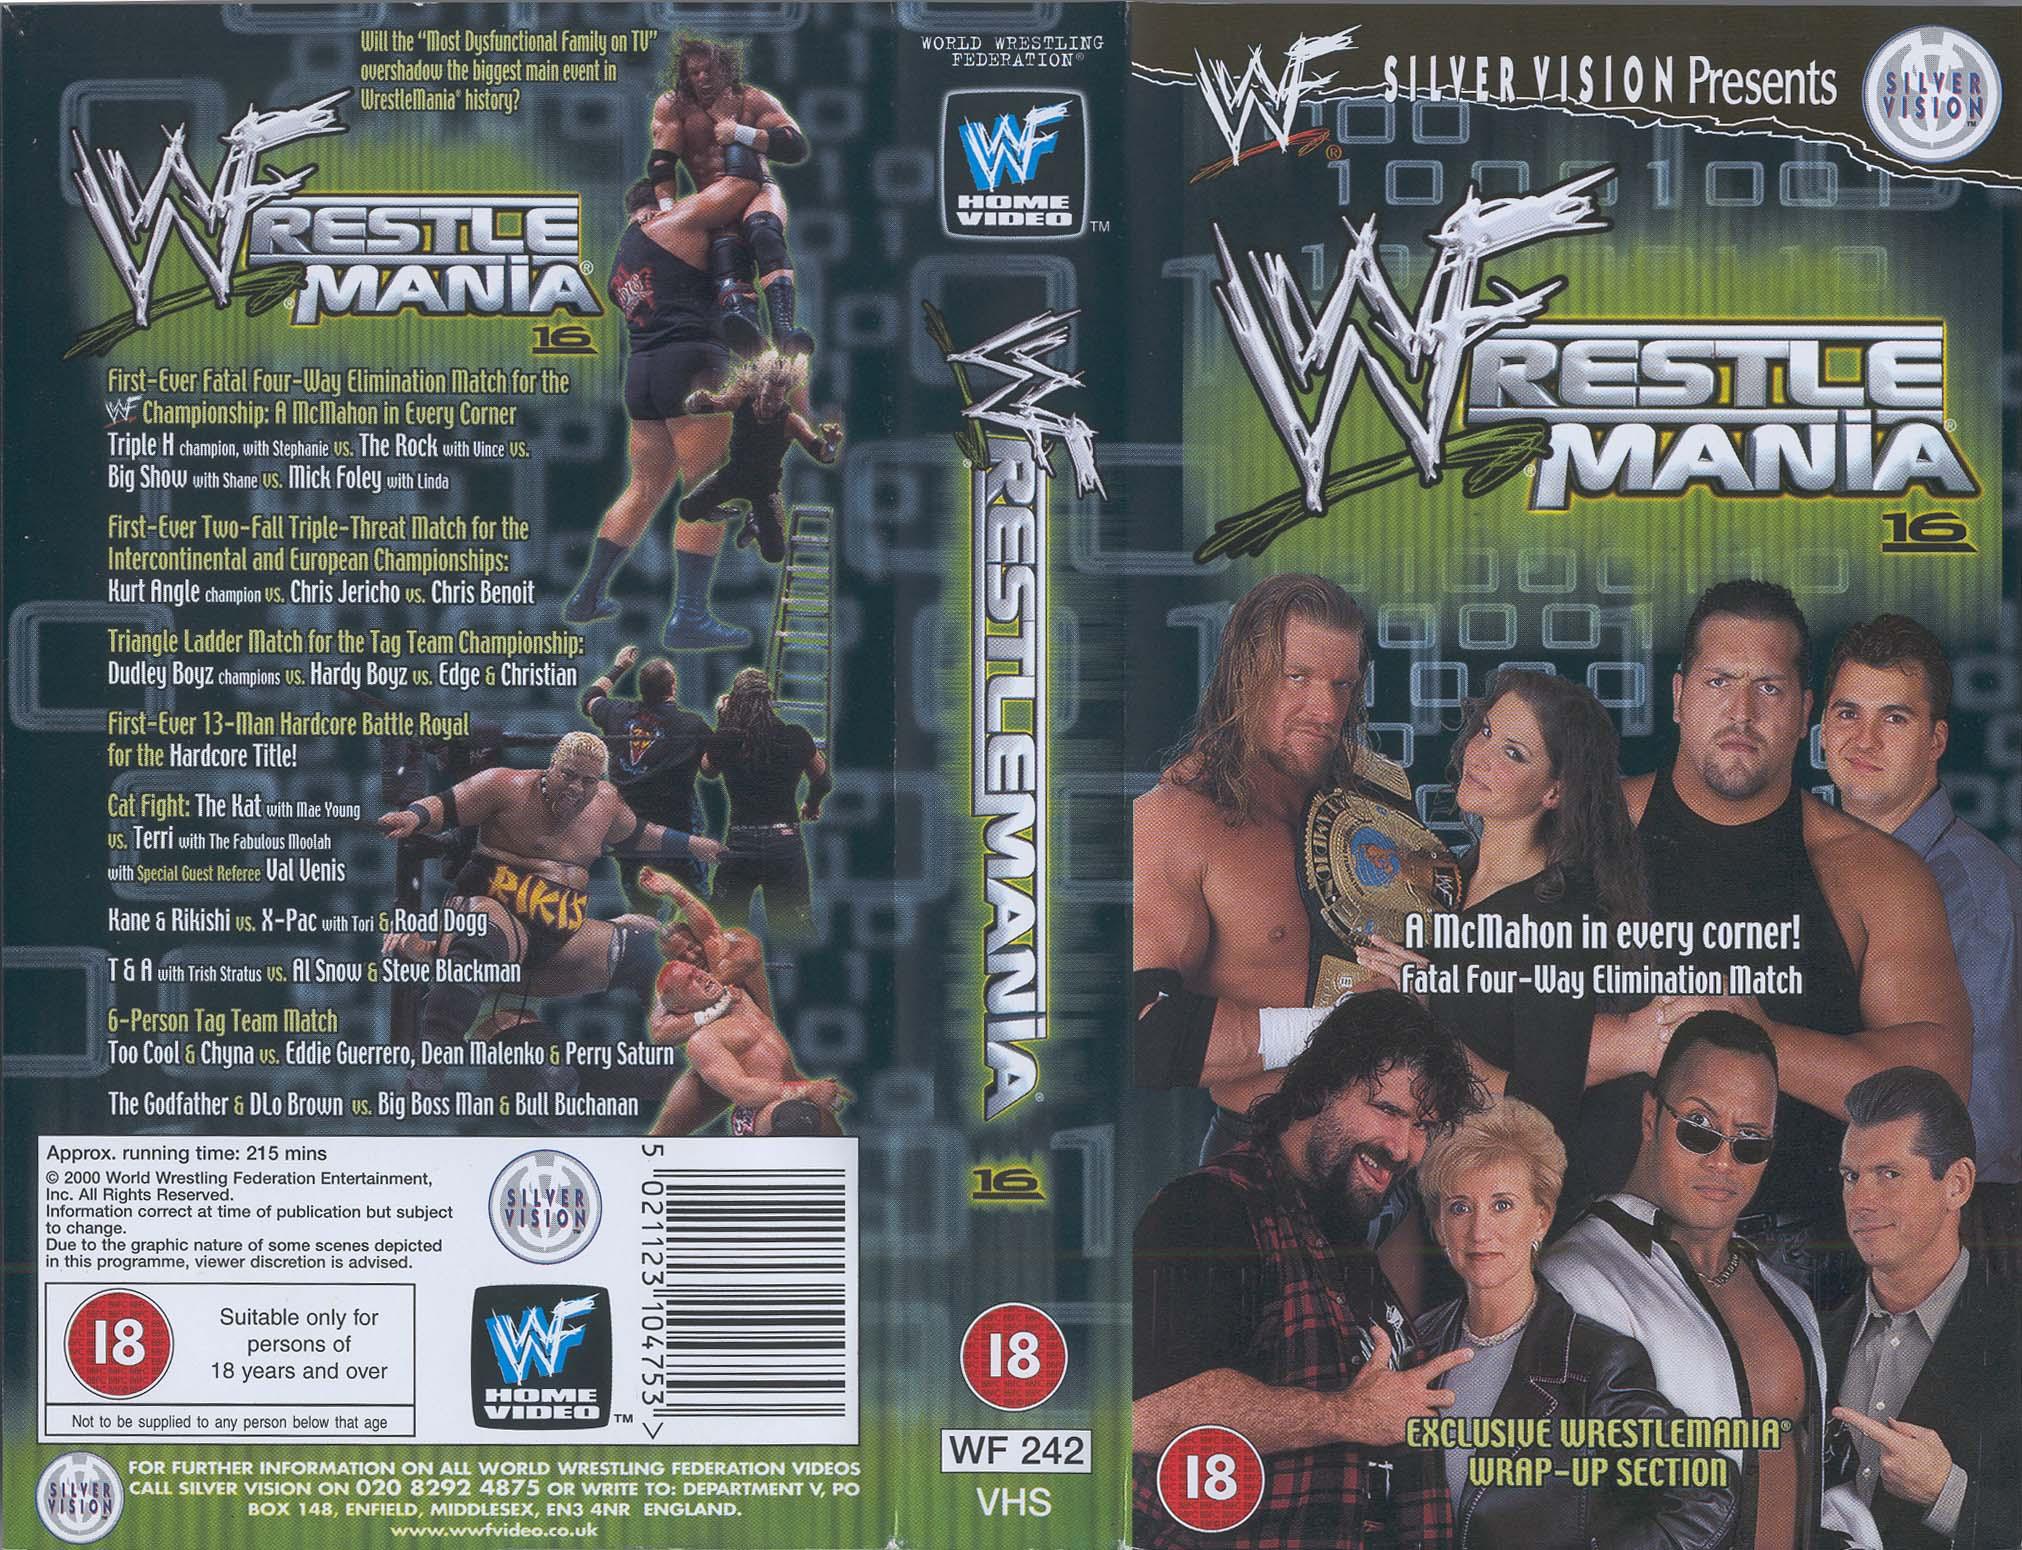 wrestlemania16